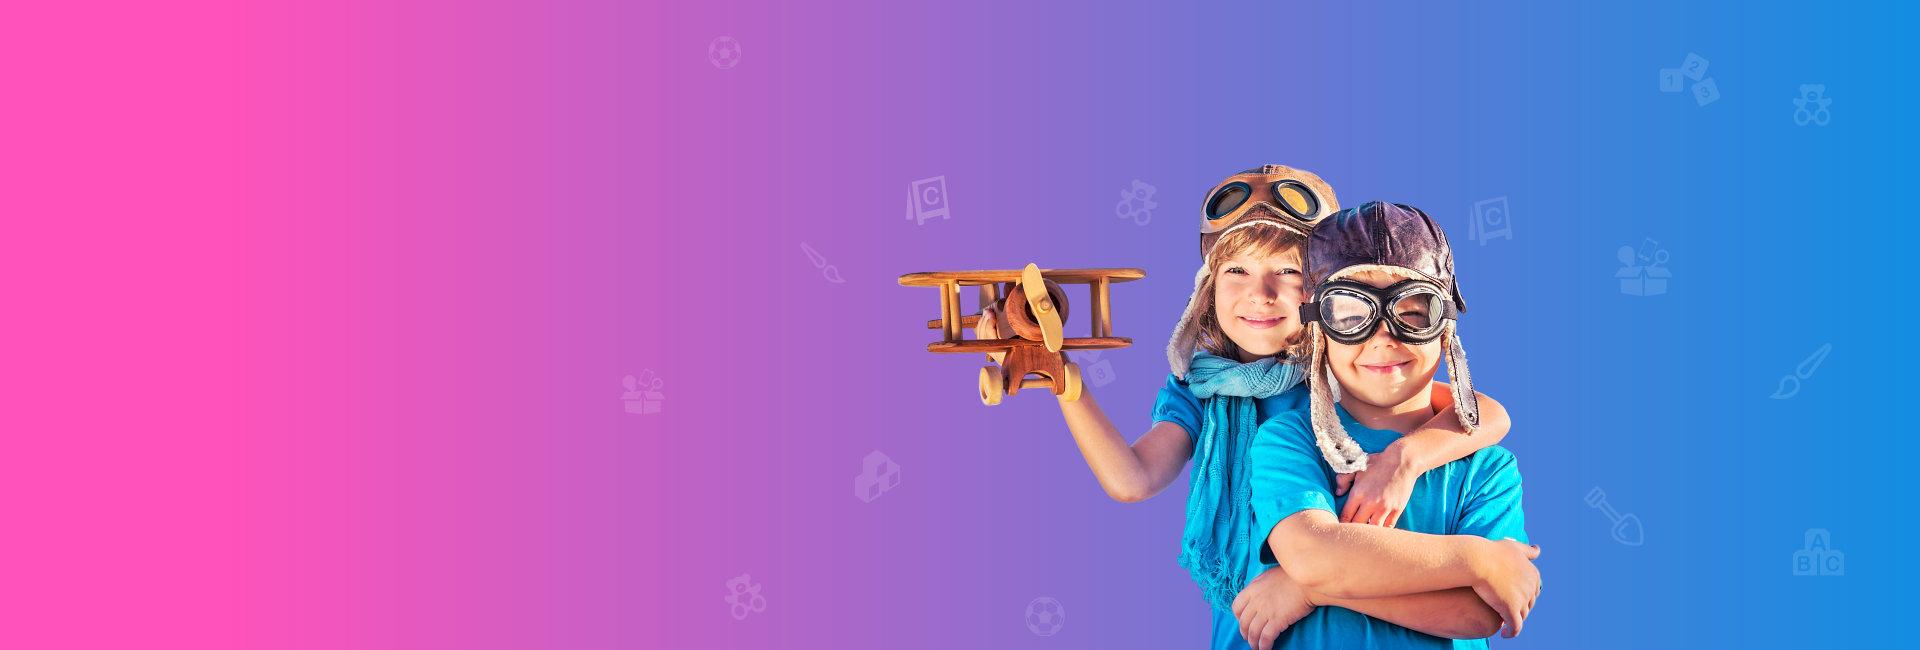 two kids playing pilot